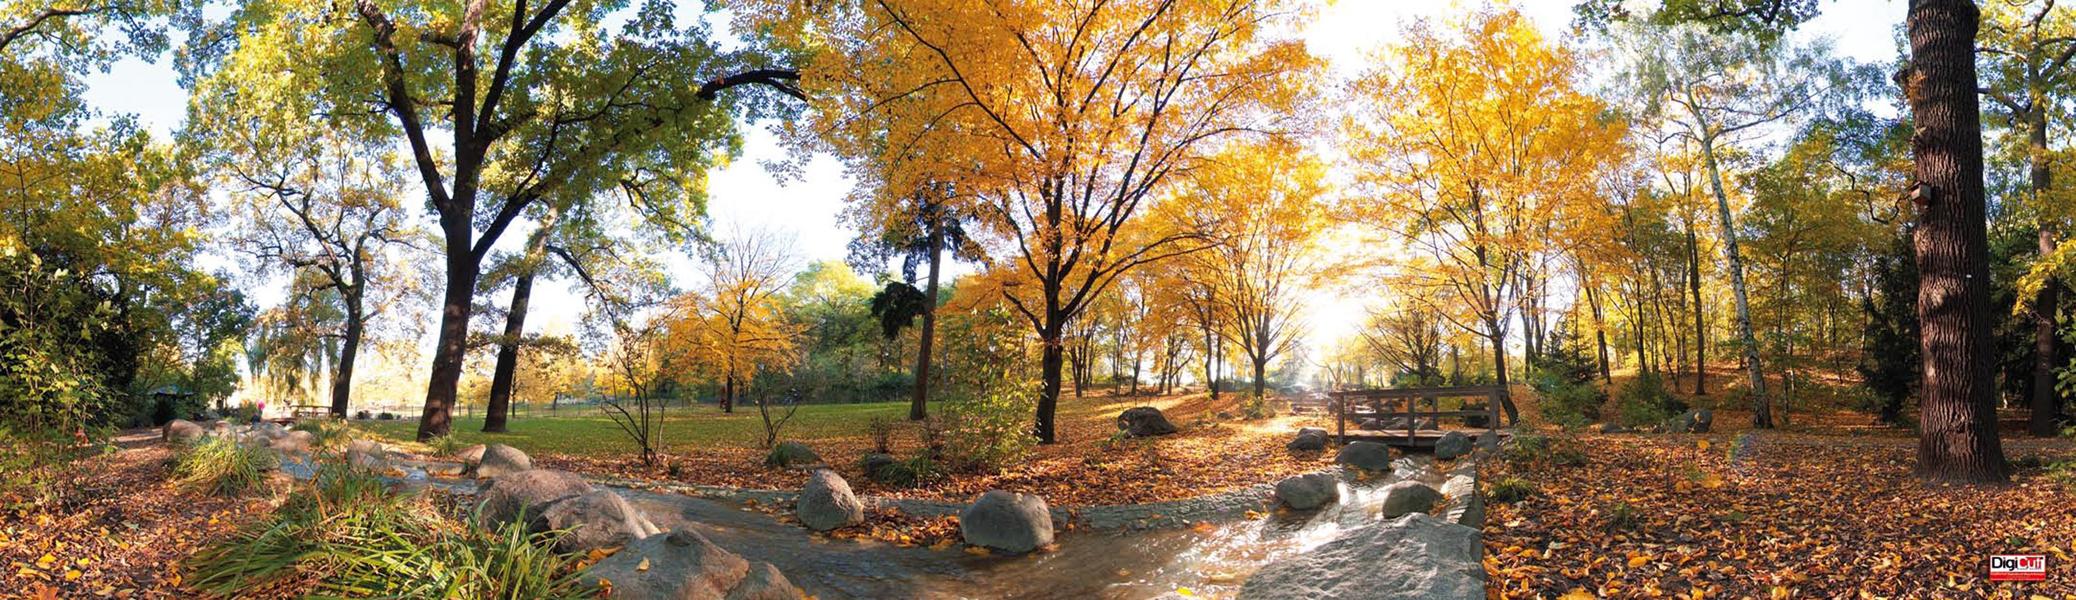 Plane Herbstwald 1100x300 cm